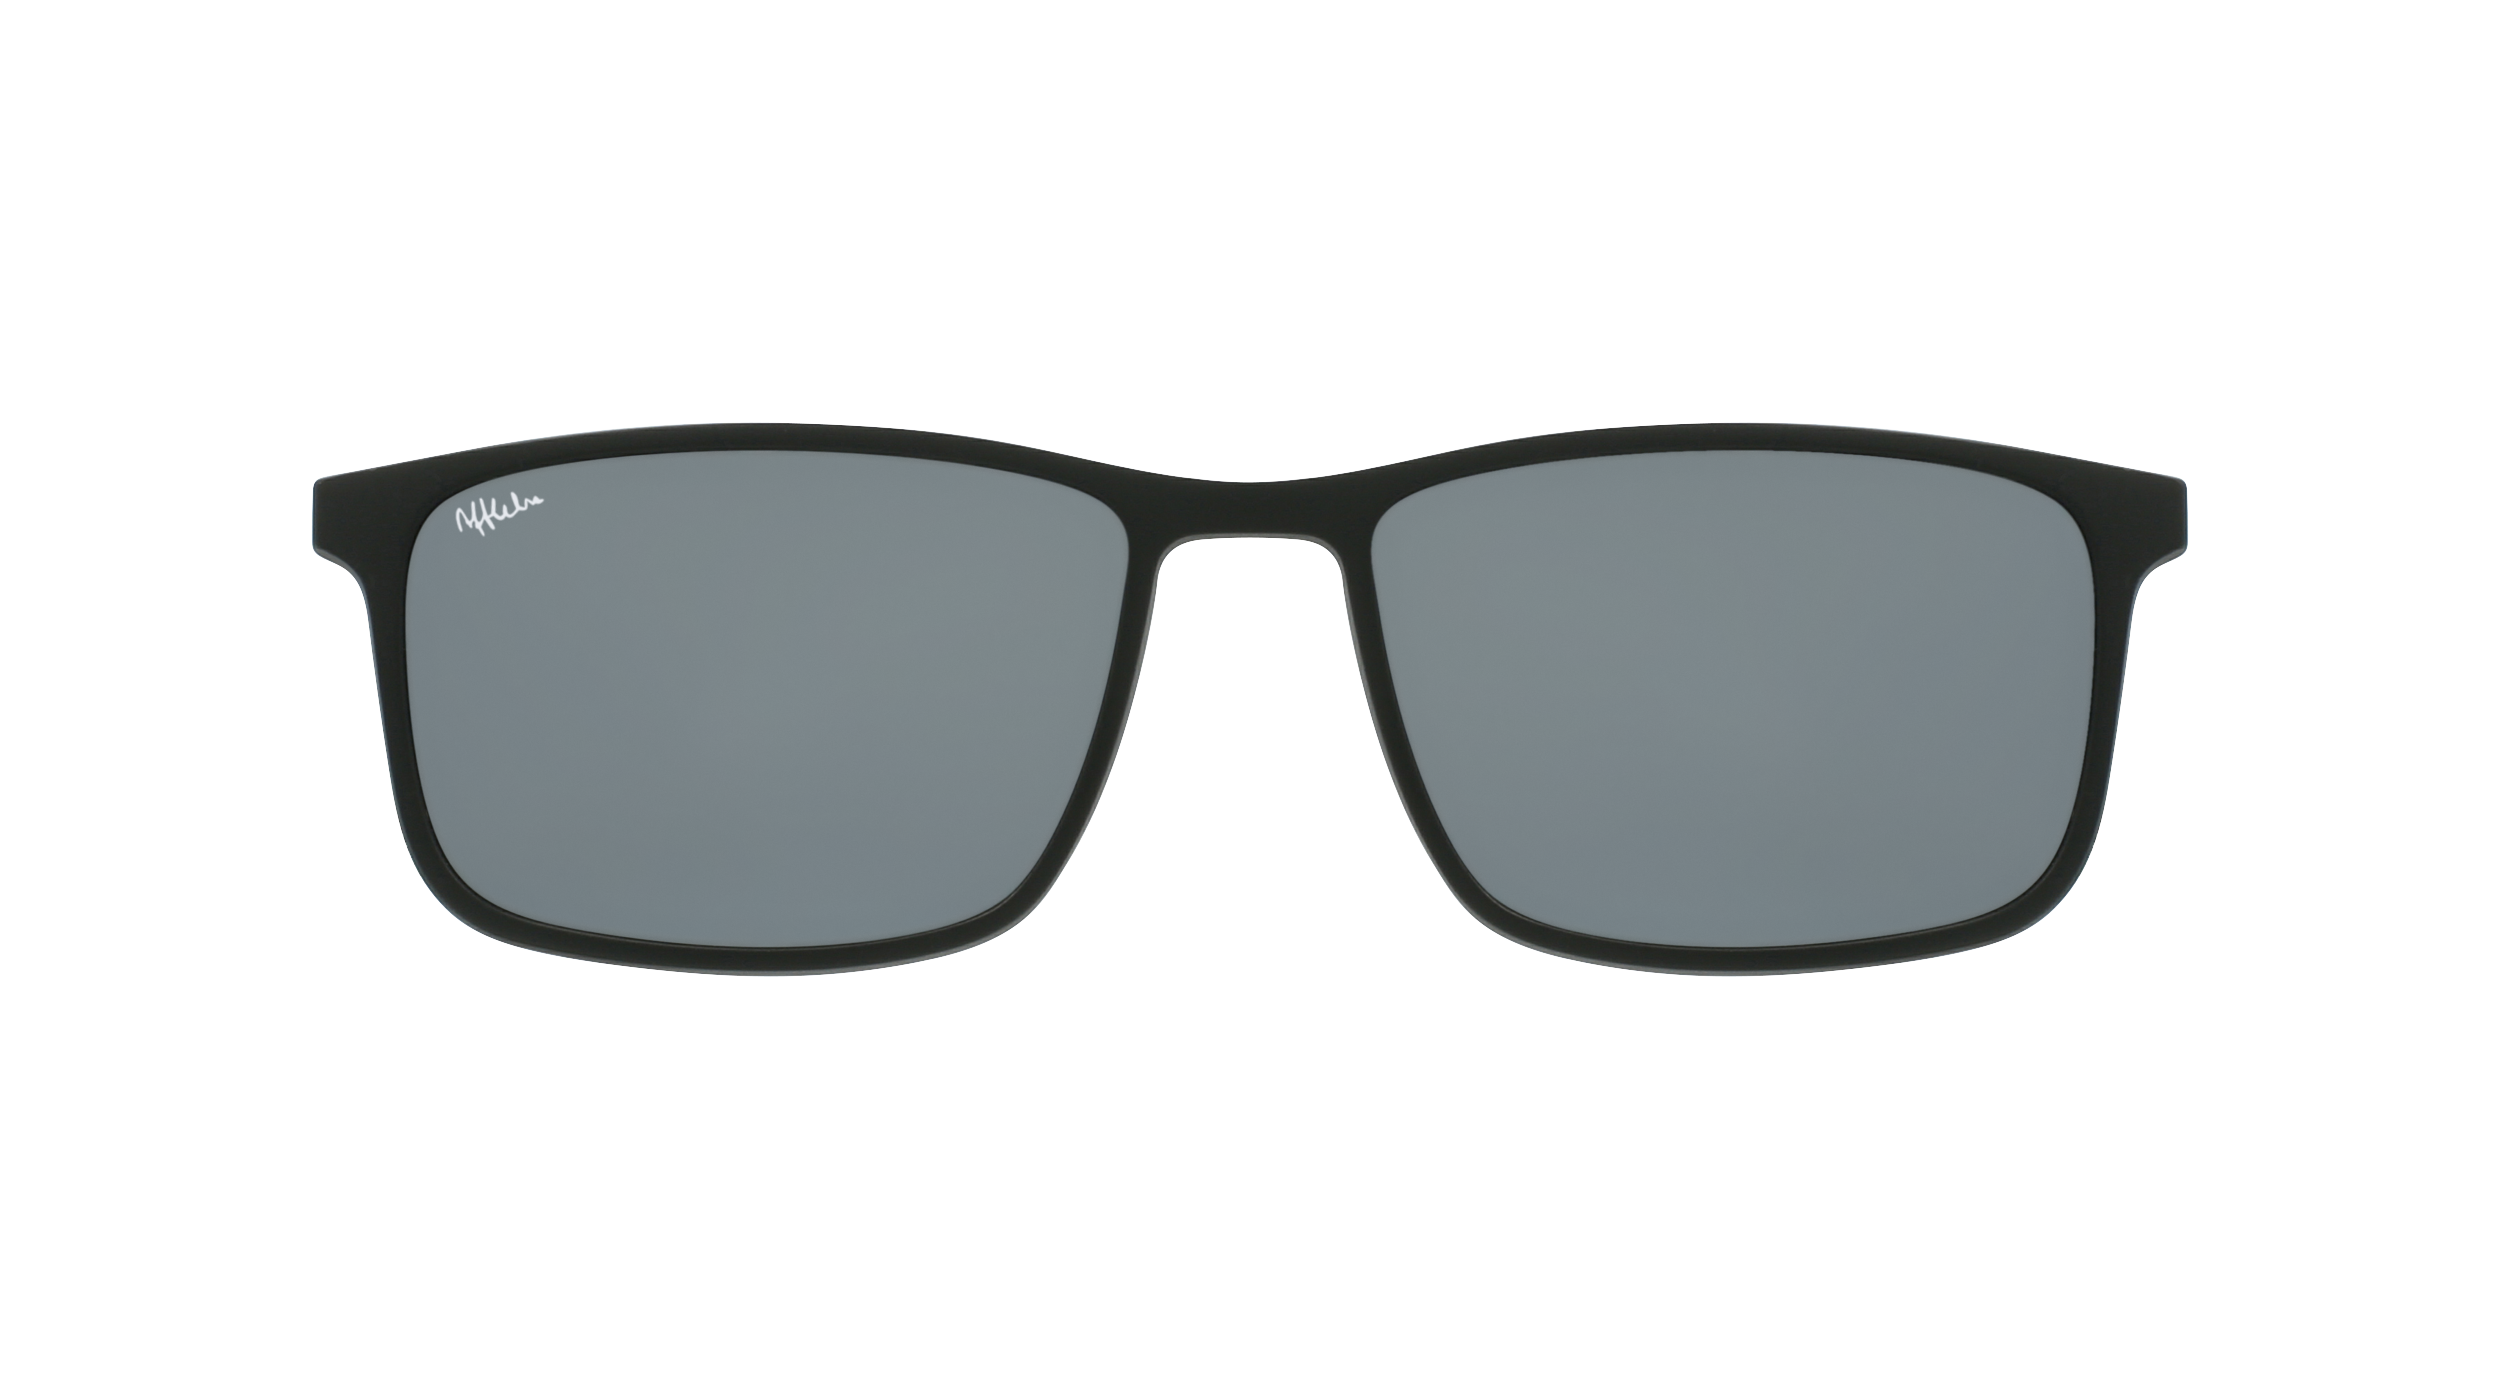 afflelou/france/products/smart_clip/clips_glasses/07630036458686.png